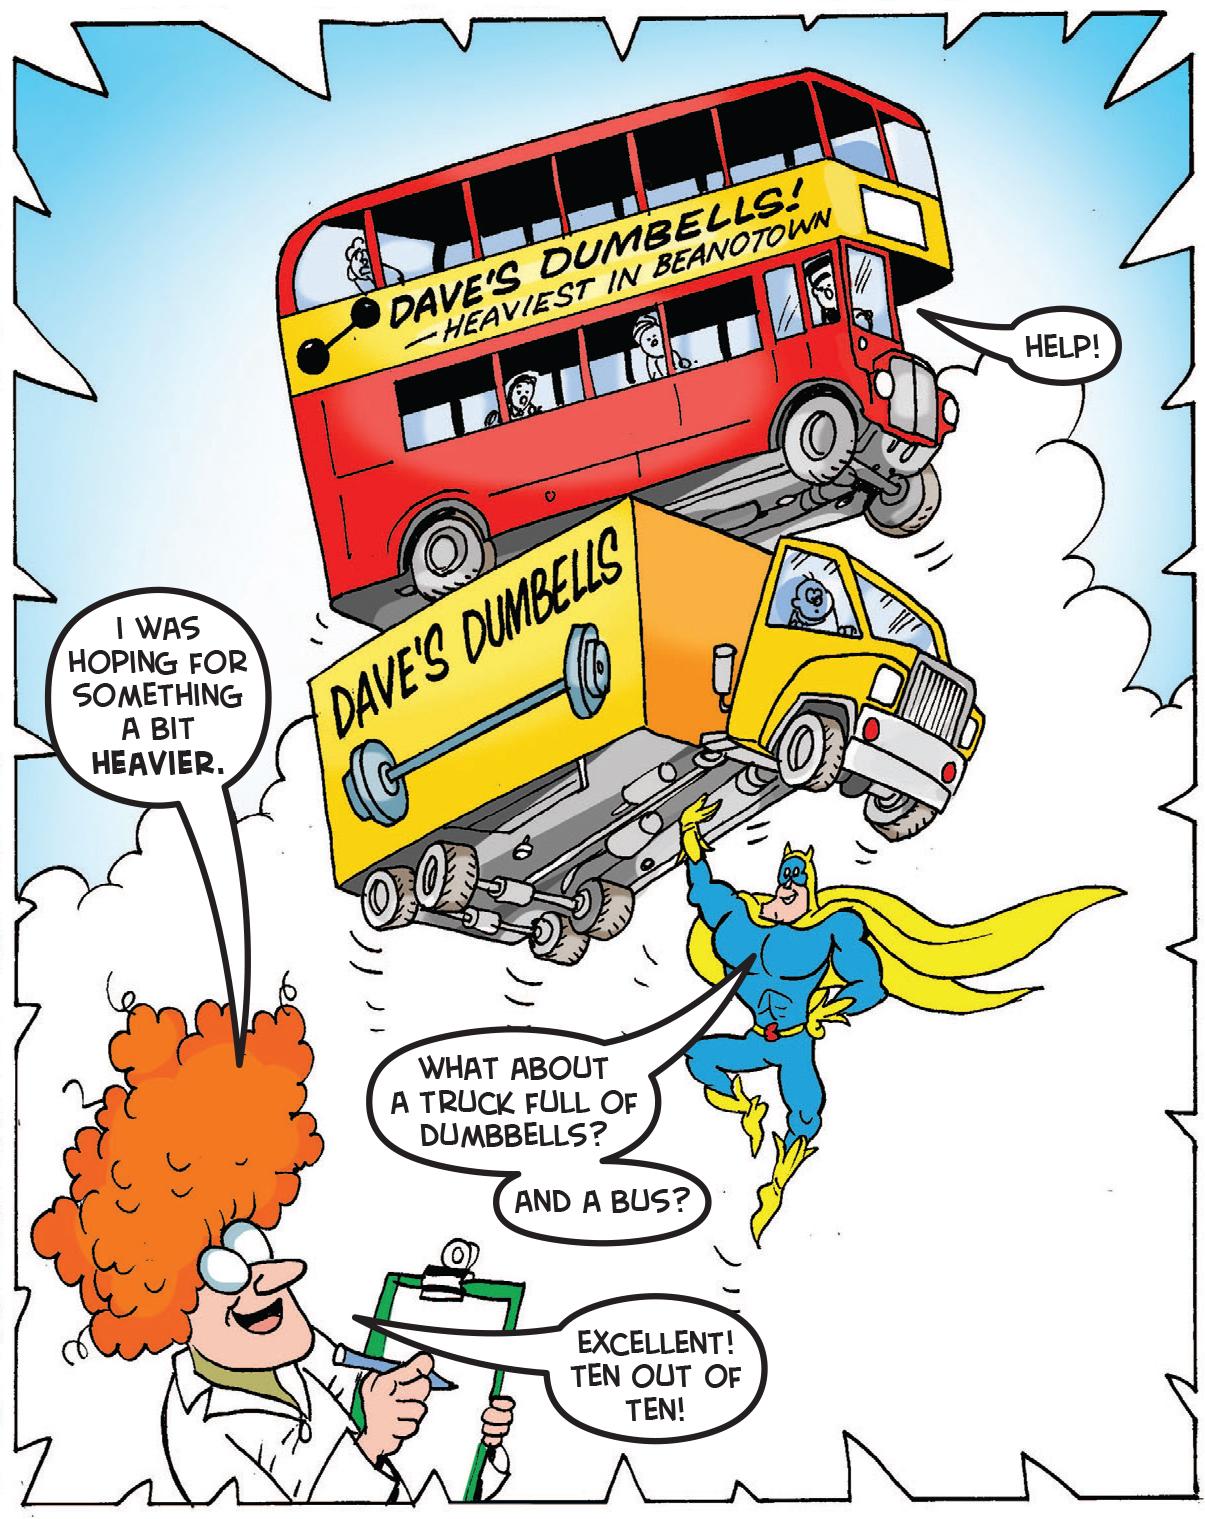 Bananaman lifts a truck and a bus